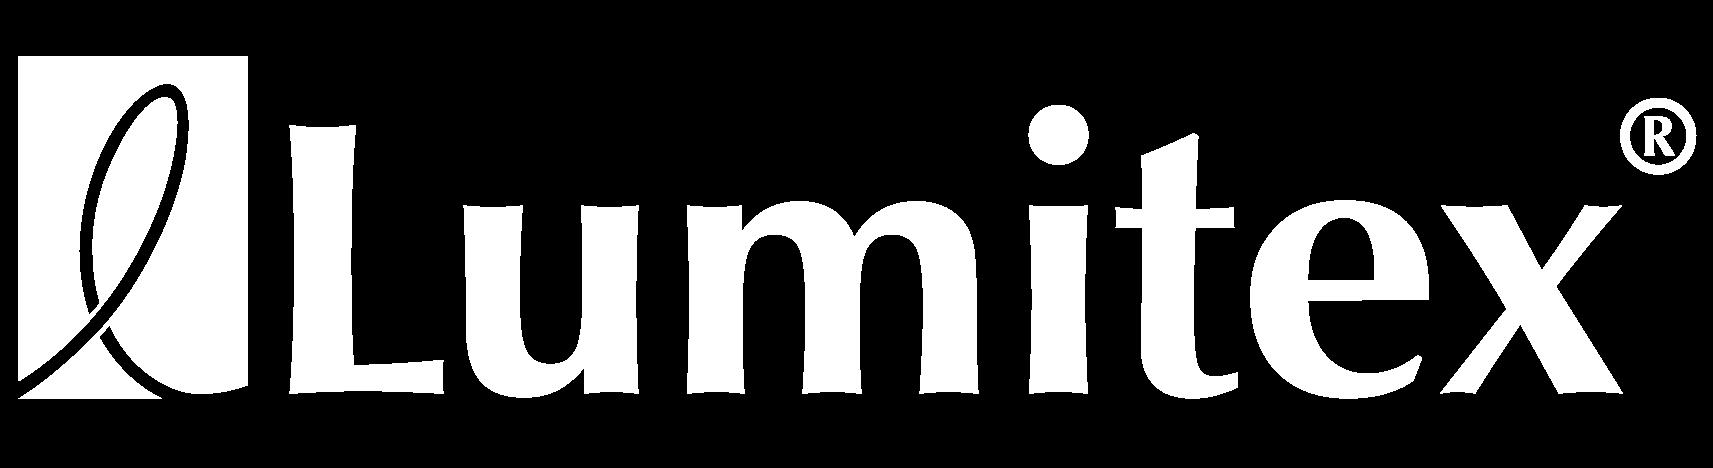 lumitex-web-logo-white.png